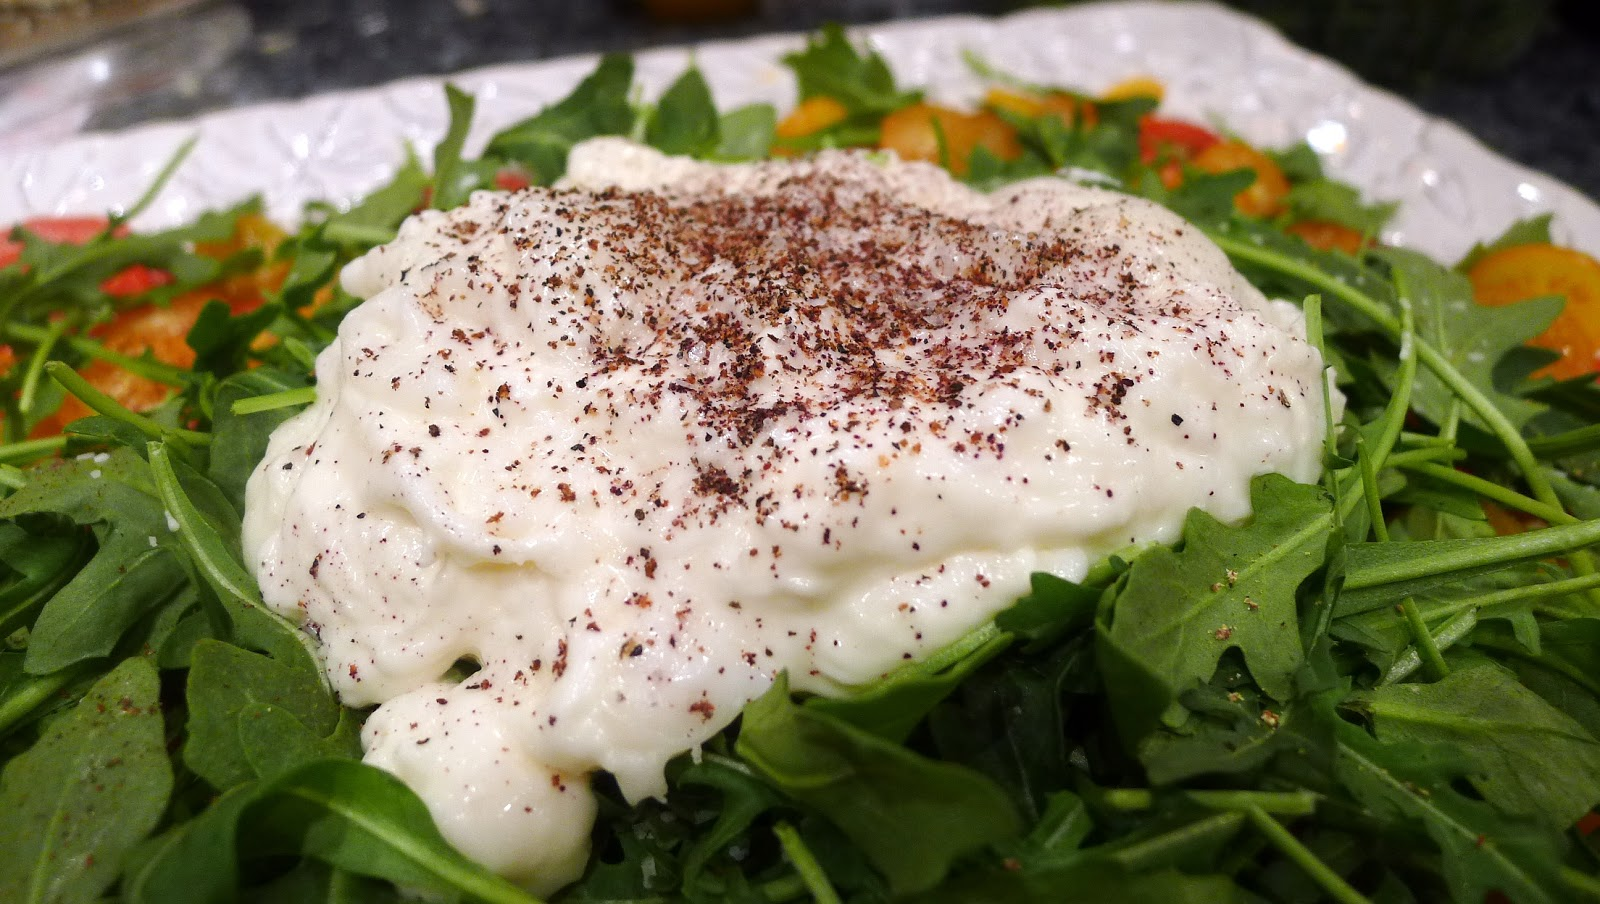 newFOOD tuesdayz: Simple Tomato and Burrata Salad